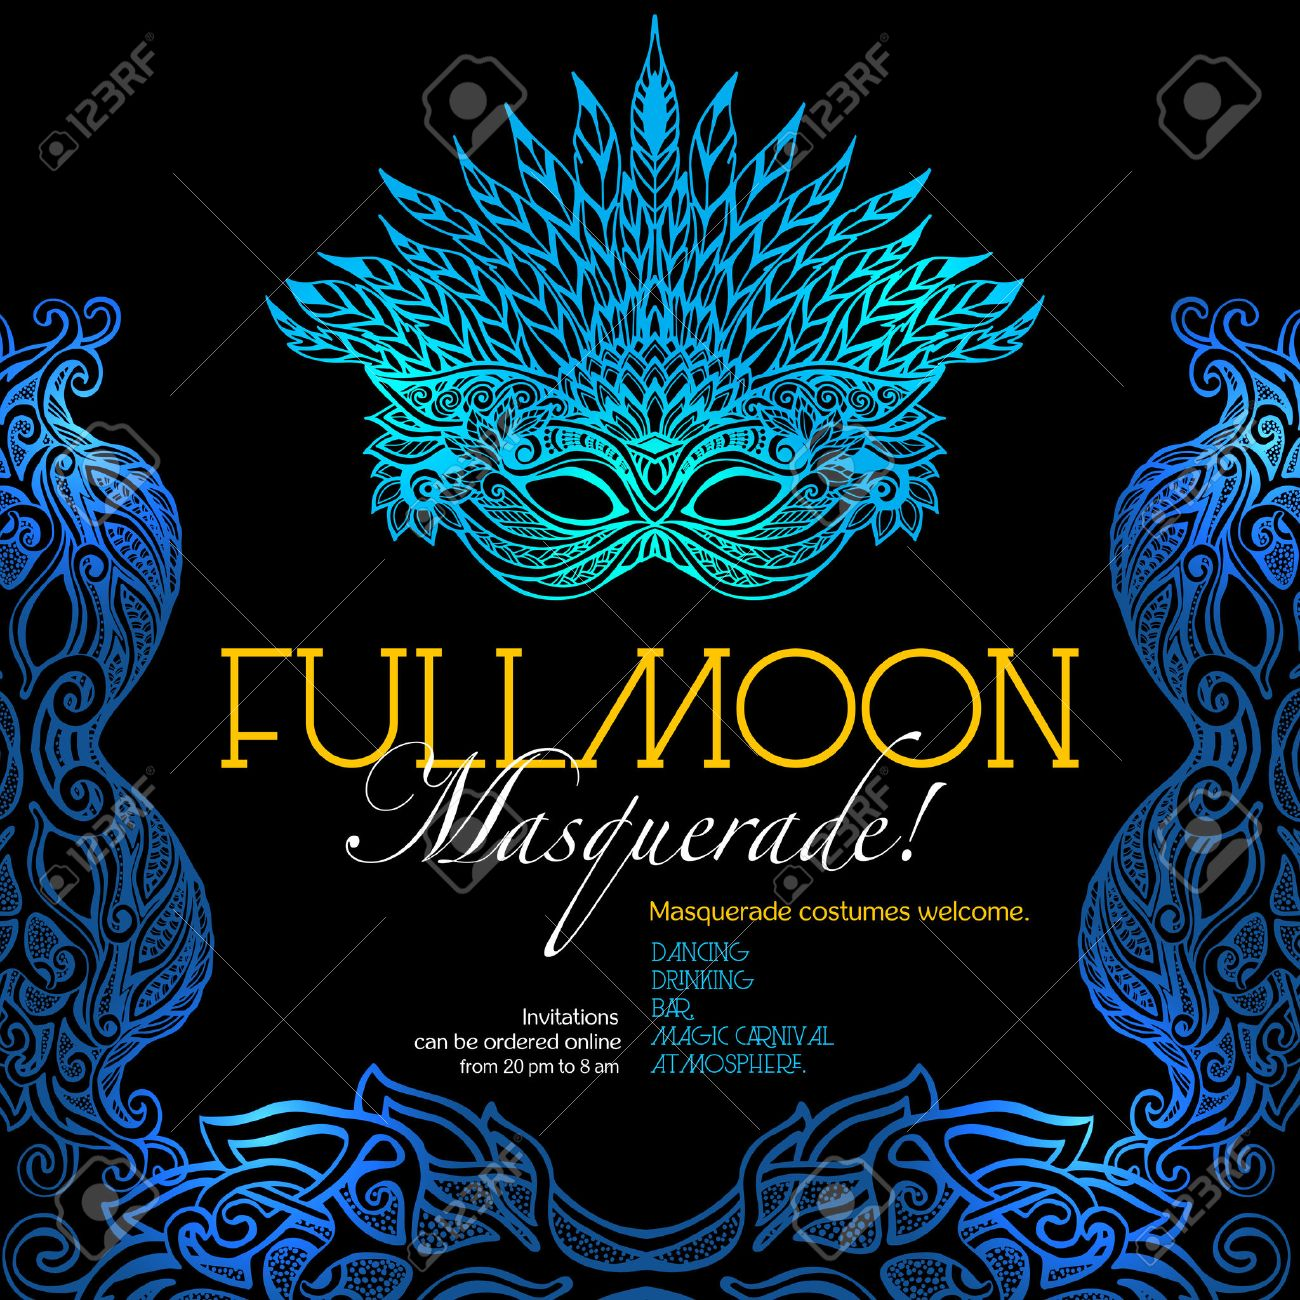 Masquerade Ball Party Invitation Poster With Retro Style Venetian ...